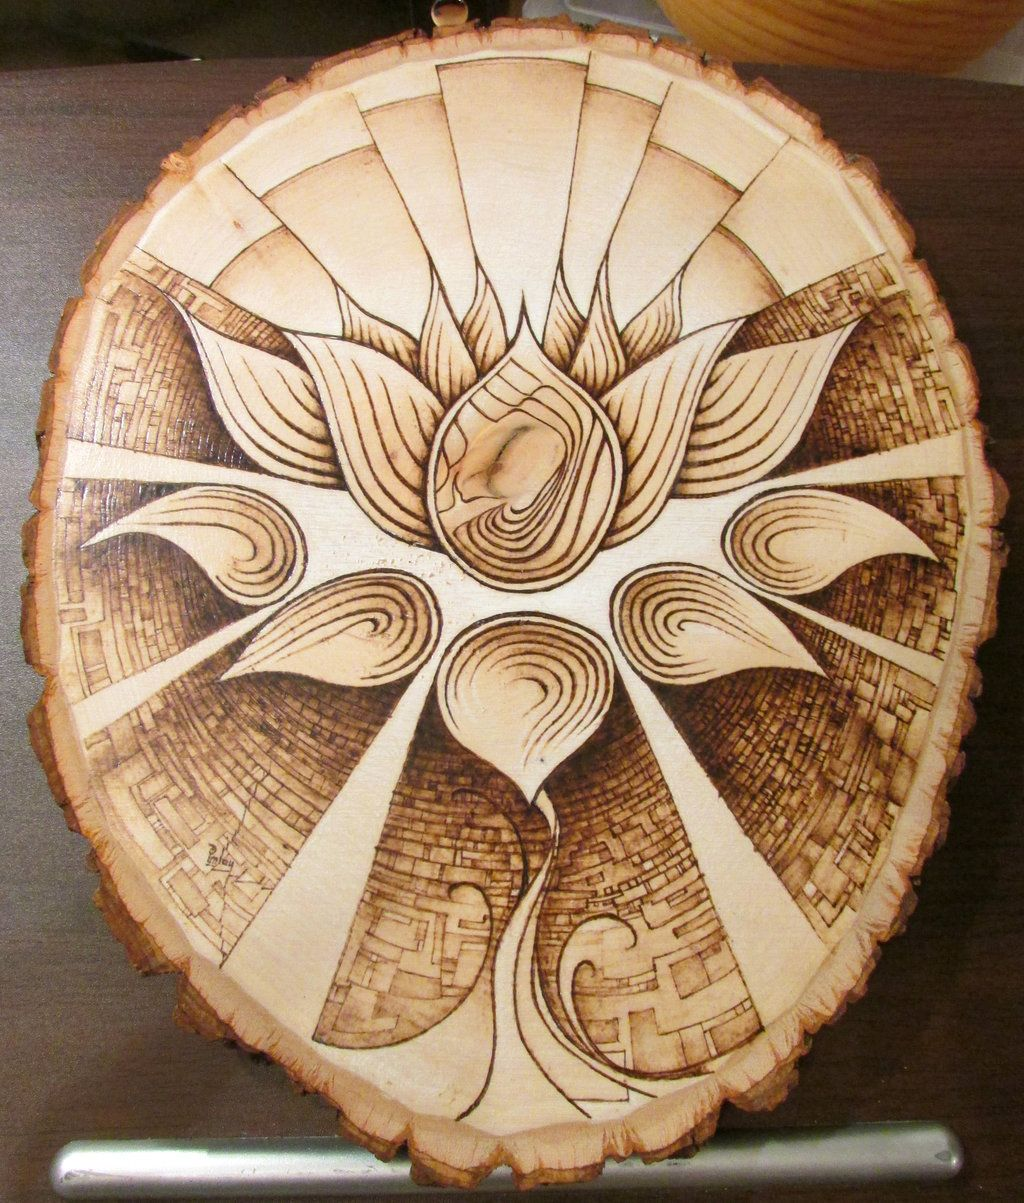 Quot Lotus Quot Pyrography Wood Burned Art On Basswood Blacklotus